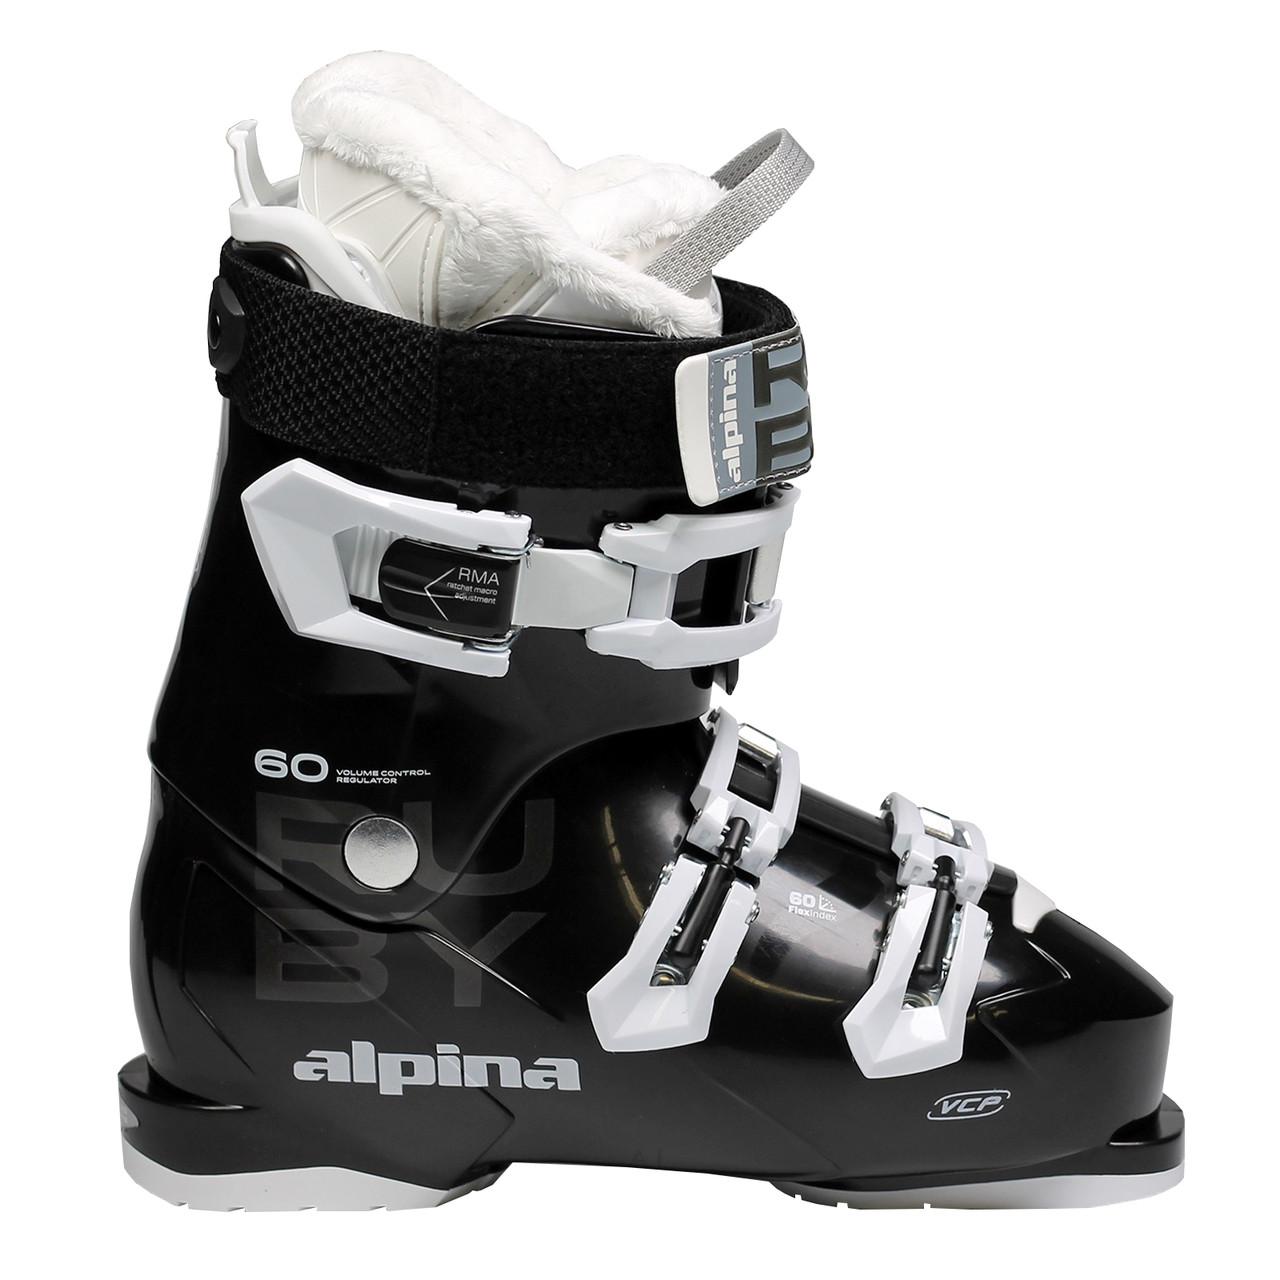 9f6acdd4dceb Alpina Ruby 60 Women s Ski Boot - Black